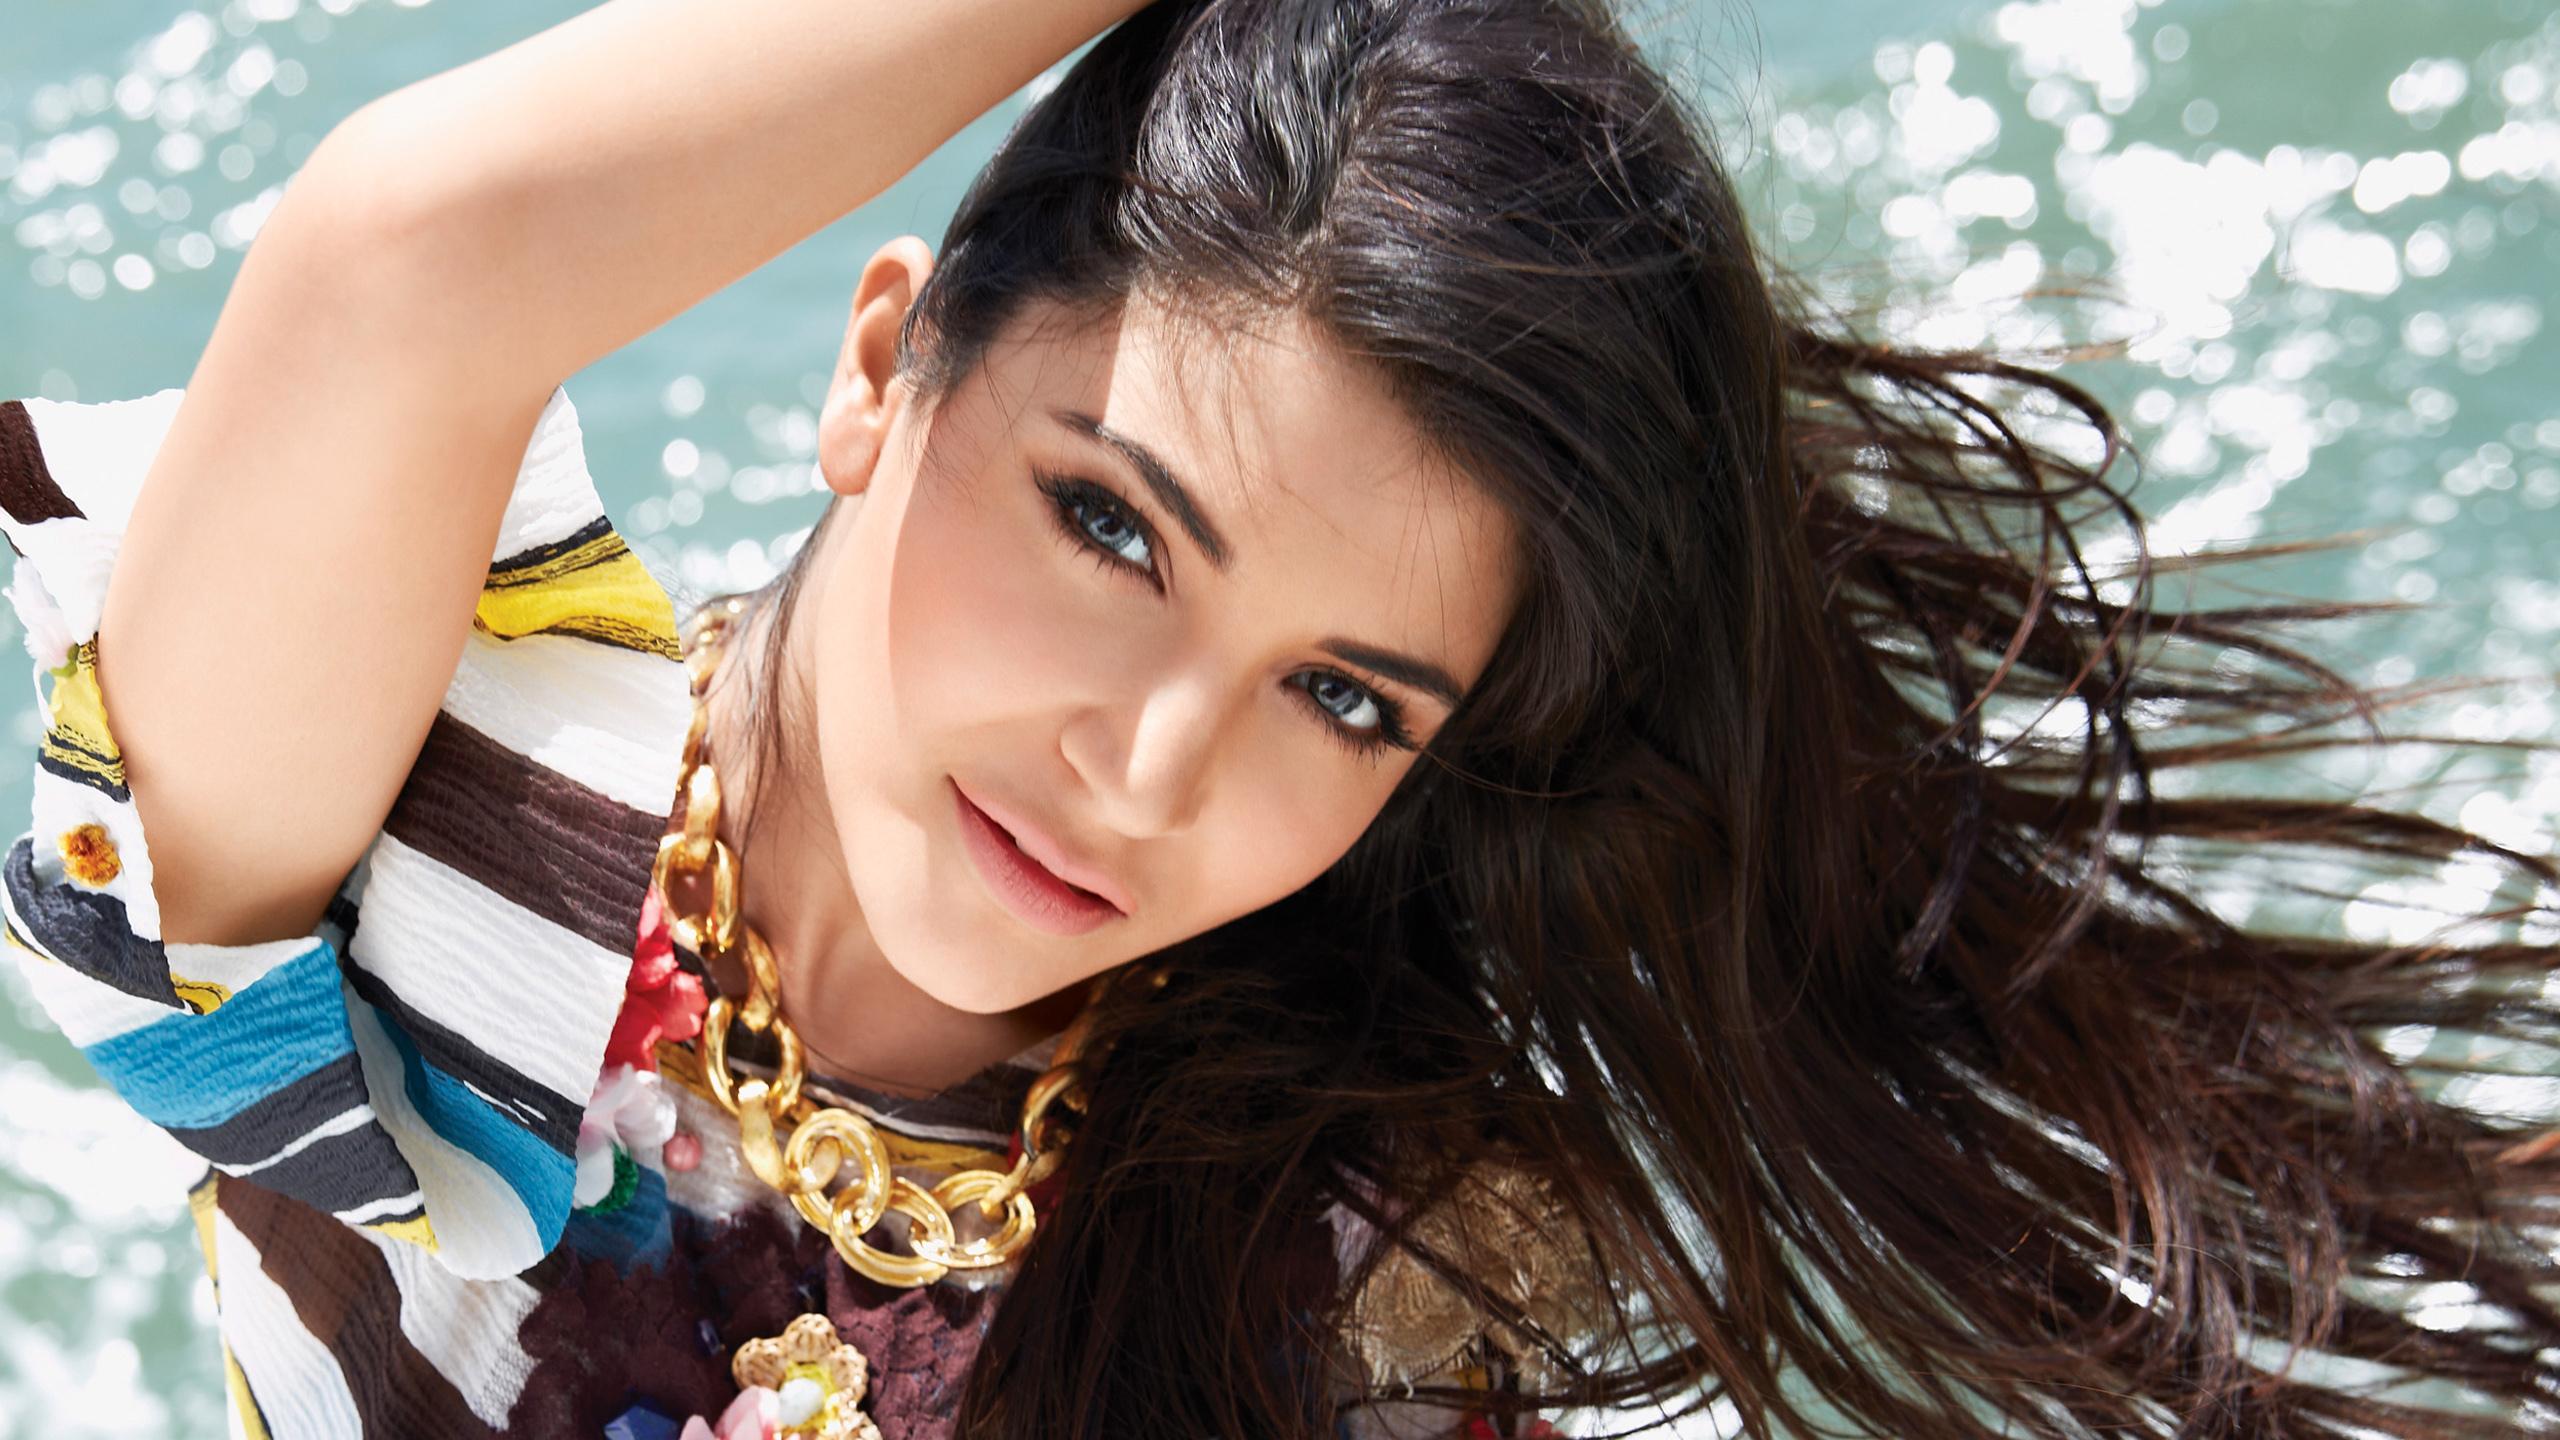 Anushka Sharma New 2016 (2560x1440)